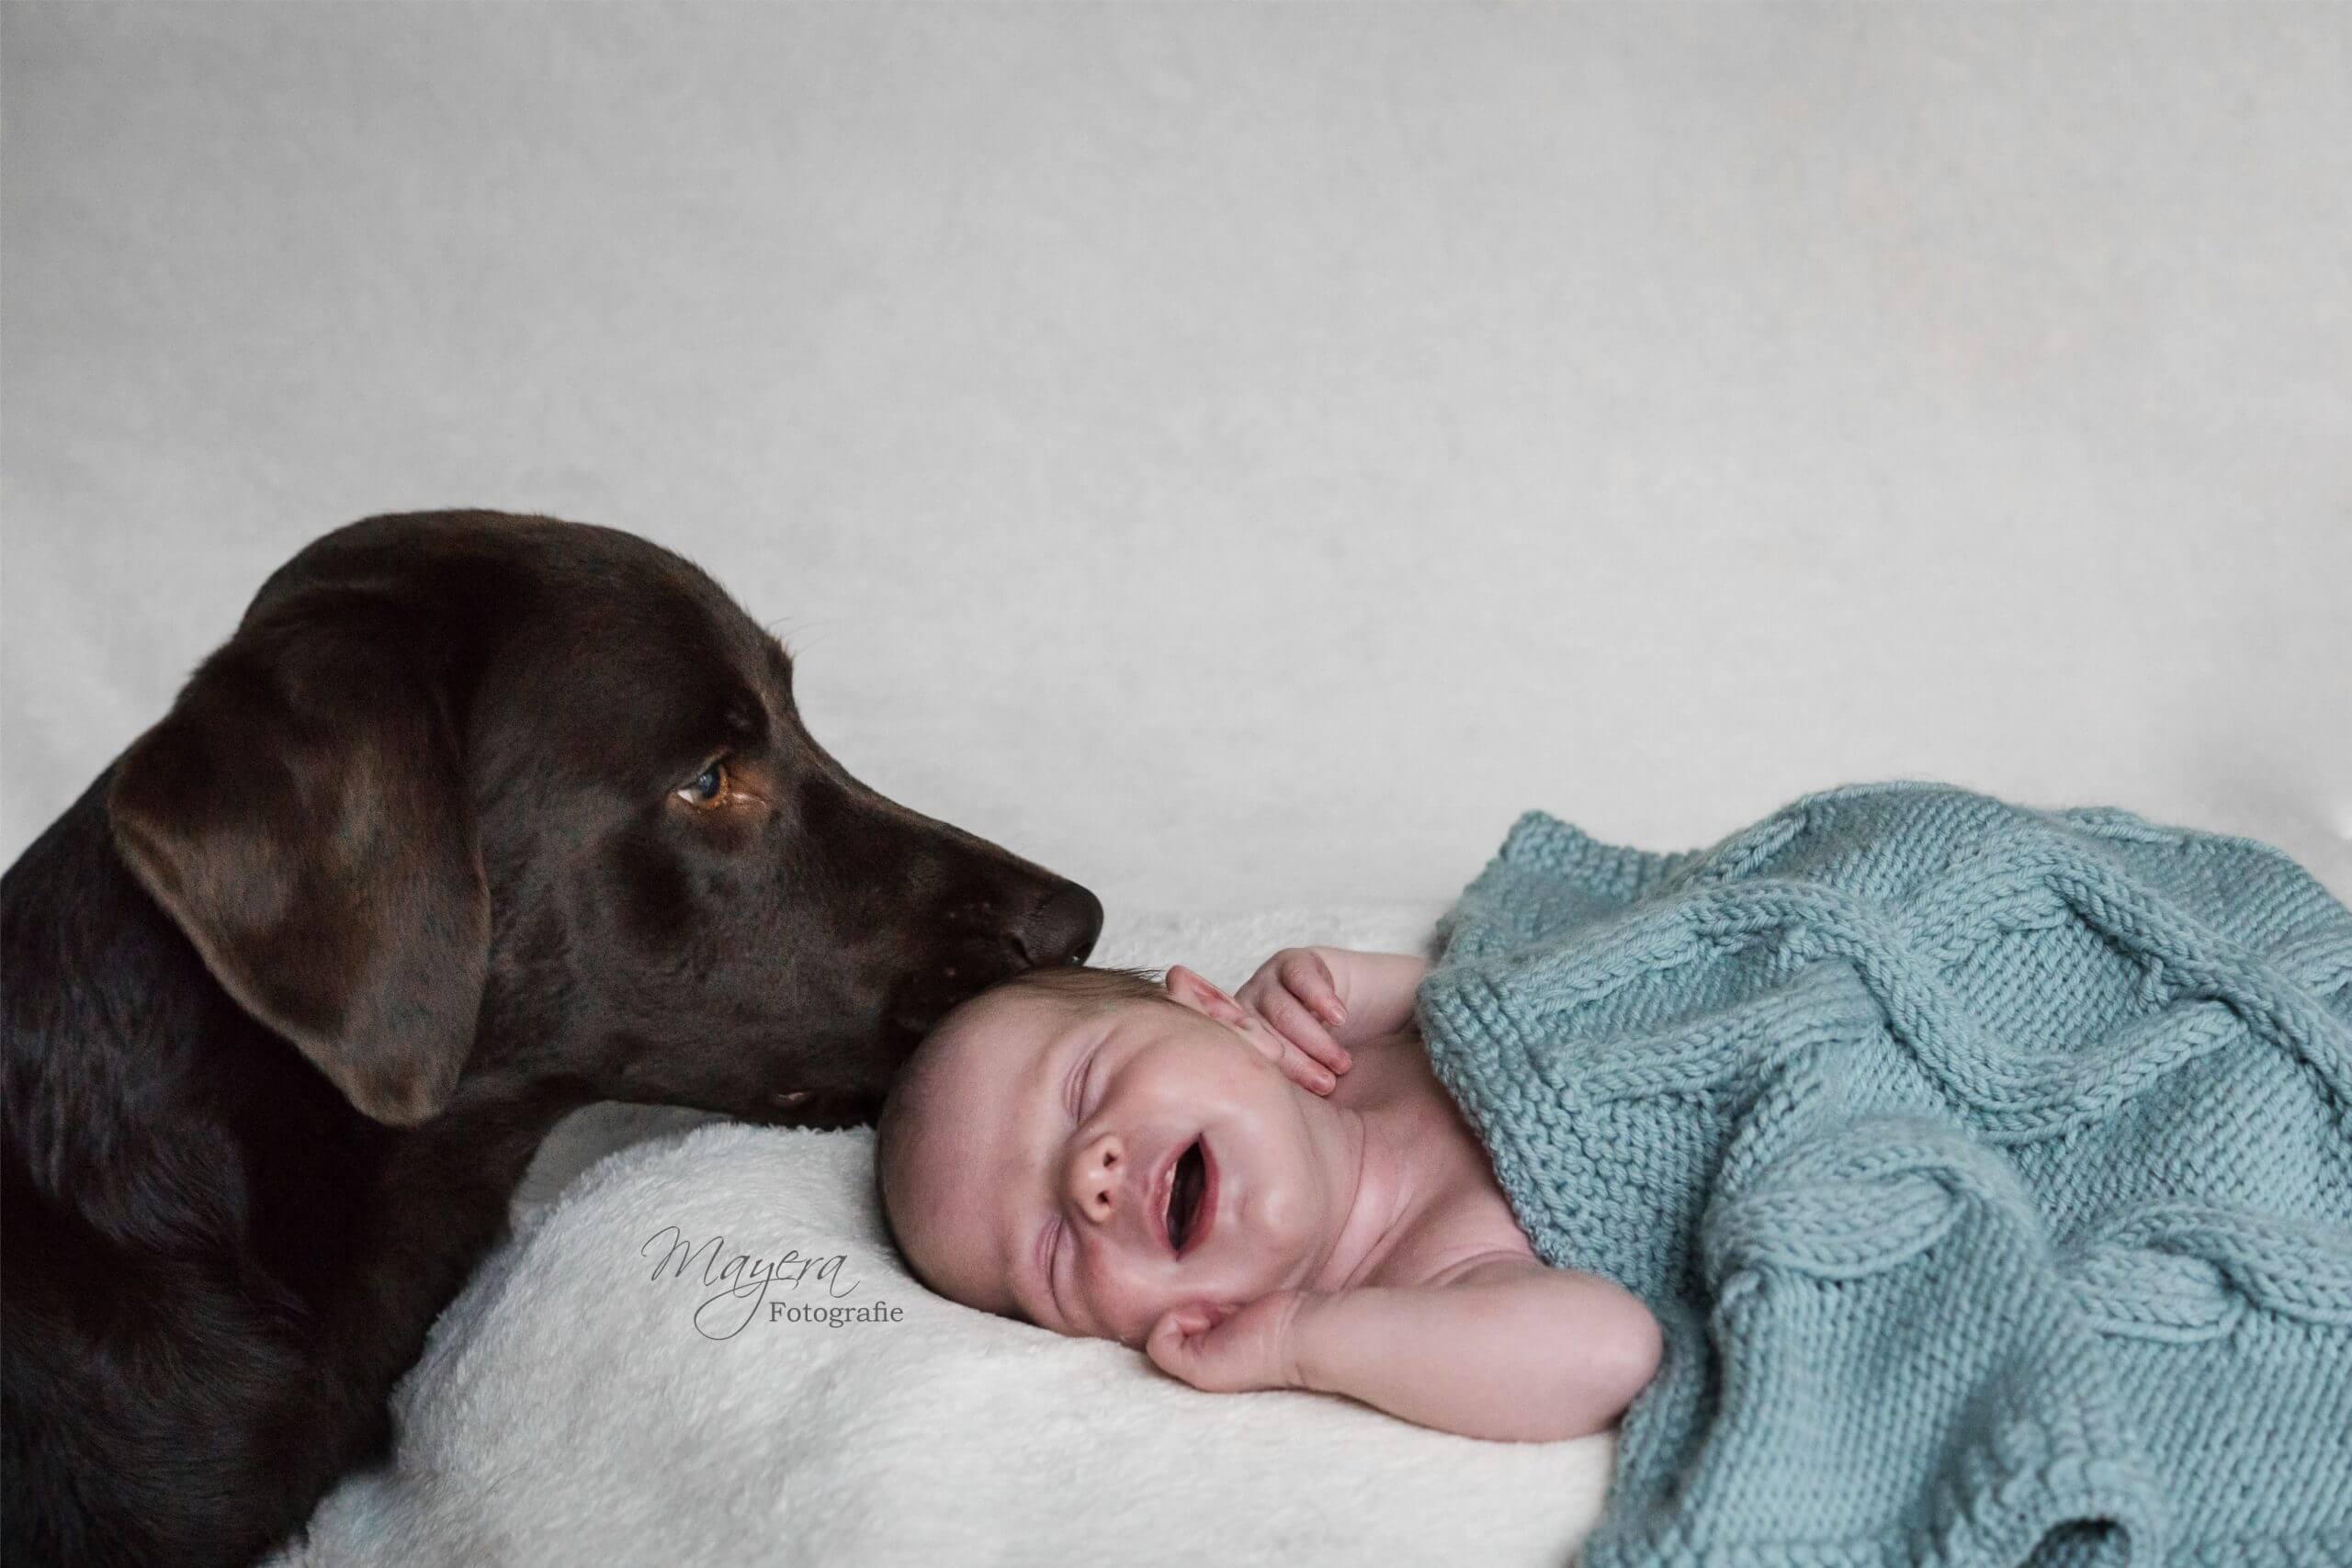 newbornfotoshoot met hond